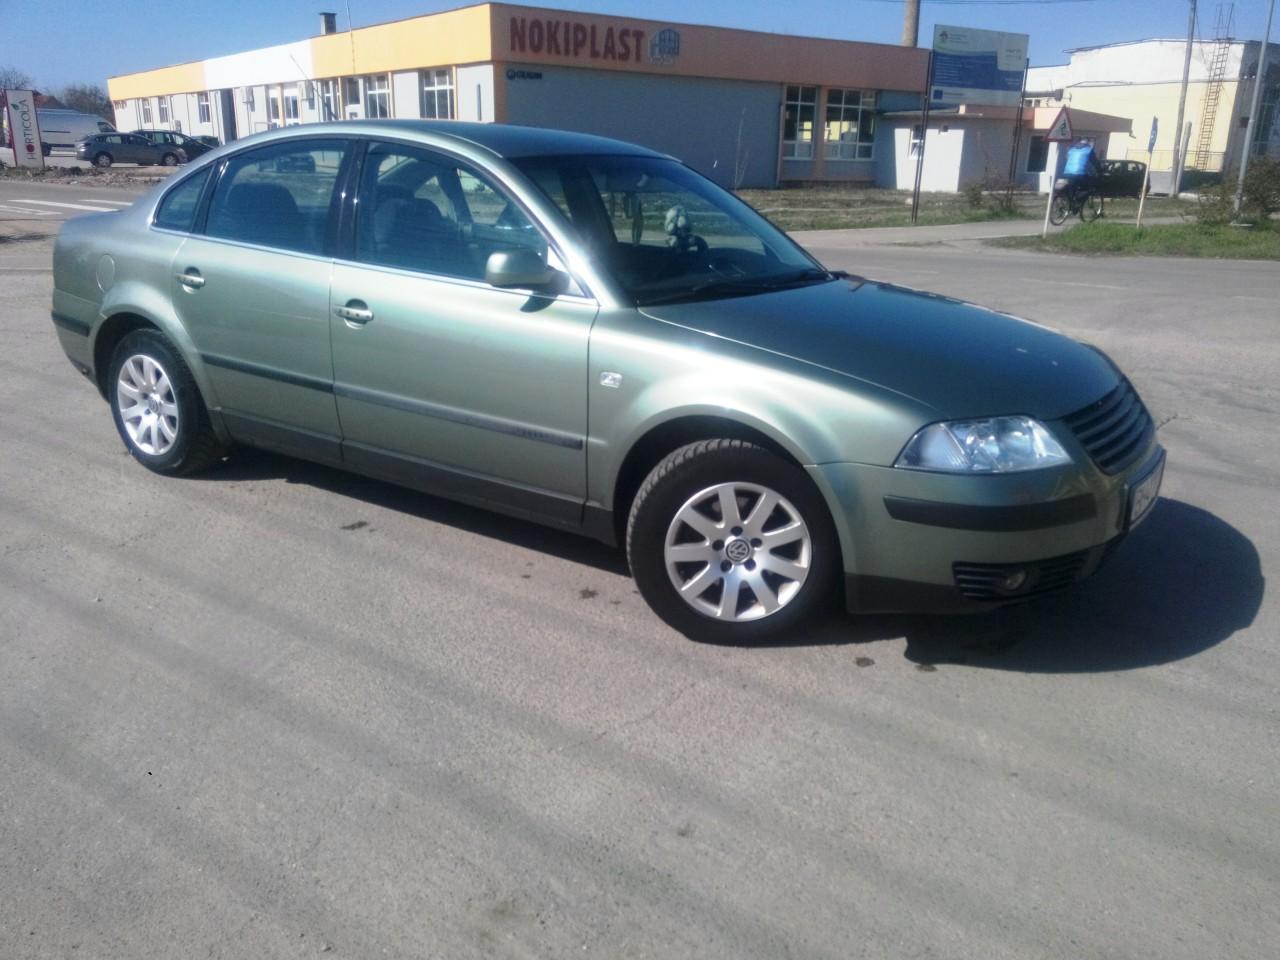 VW Passat GPL 1.6 ALZ 2002